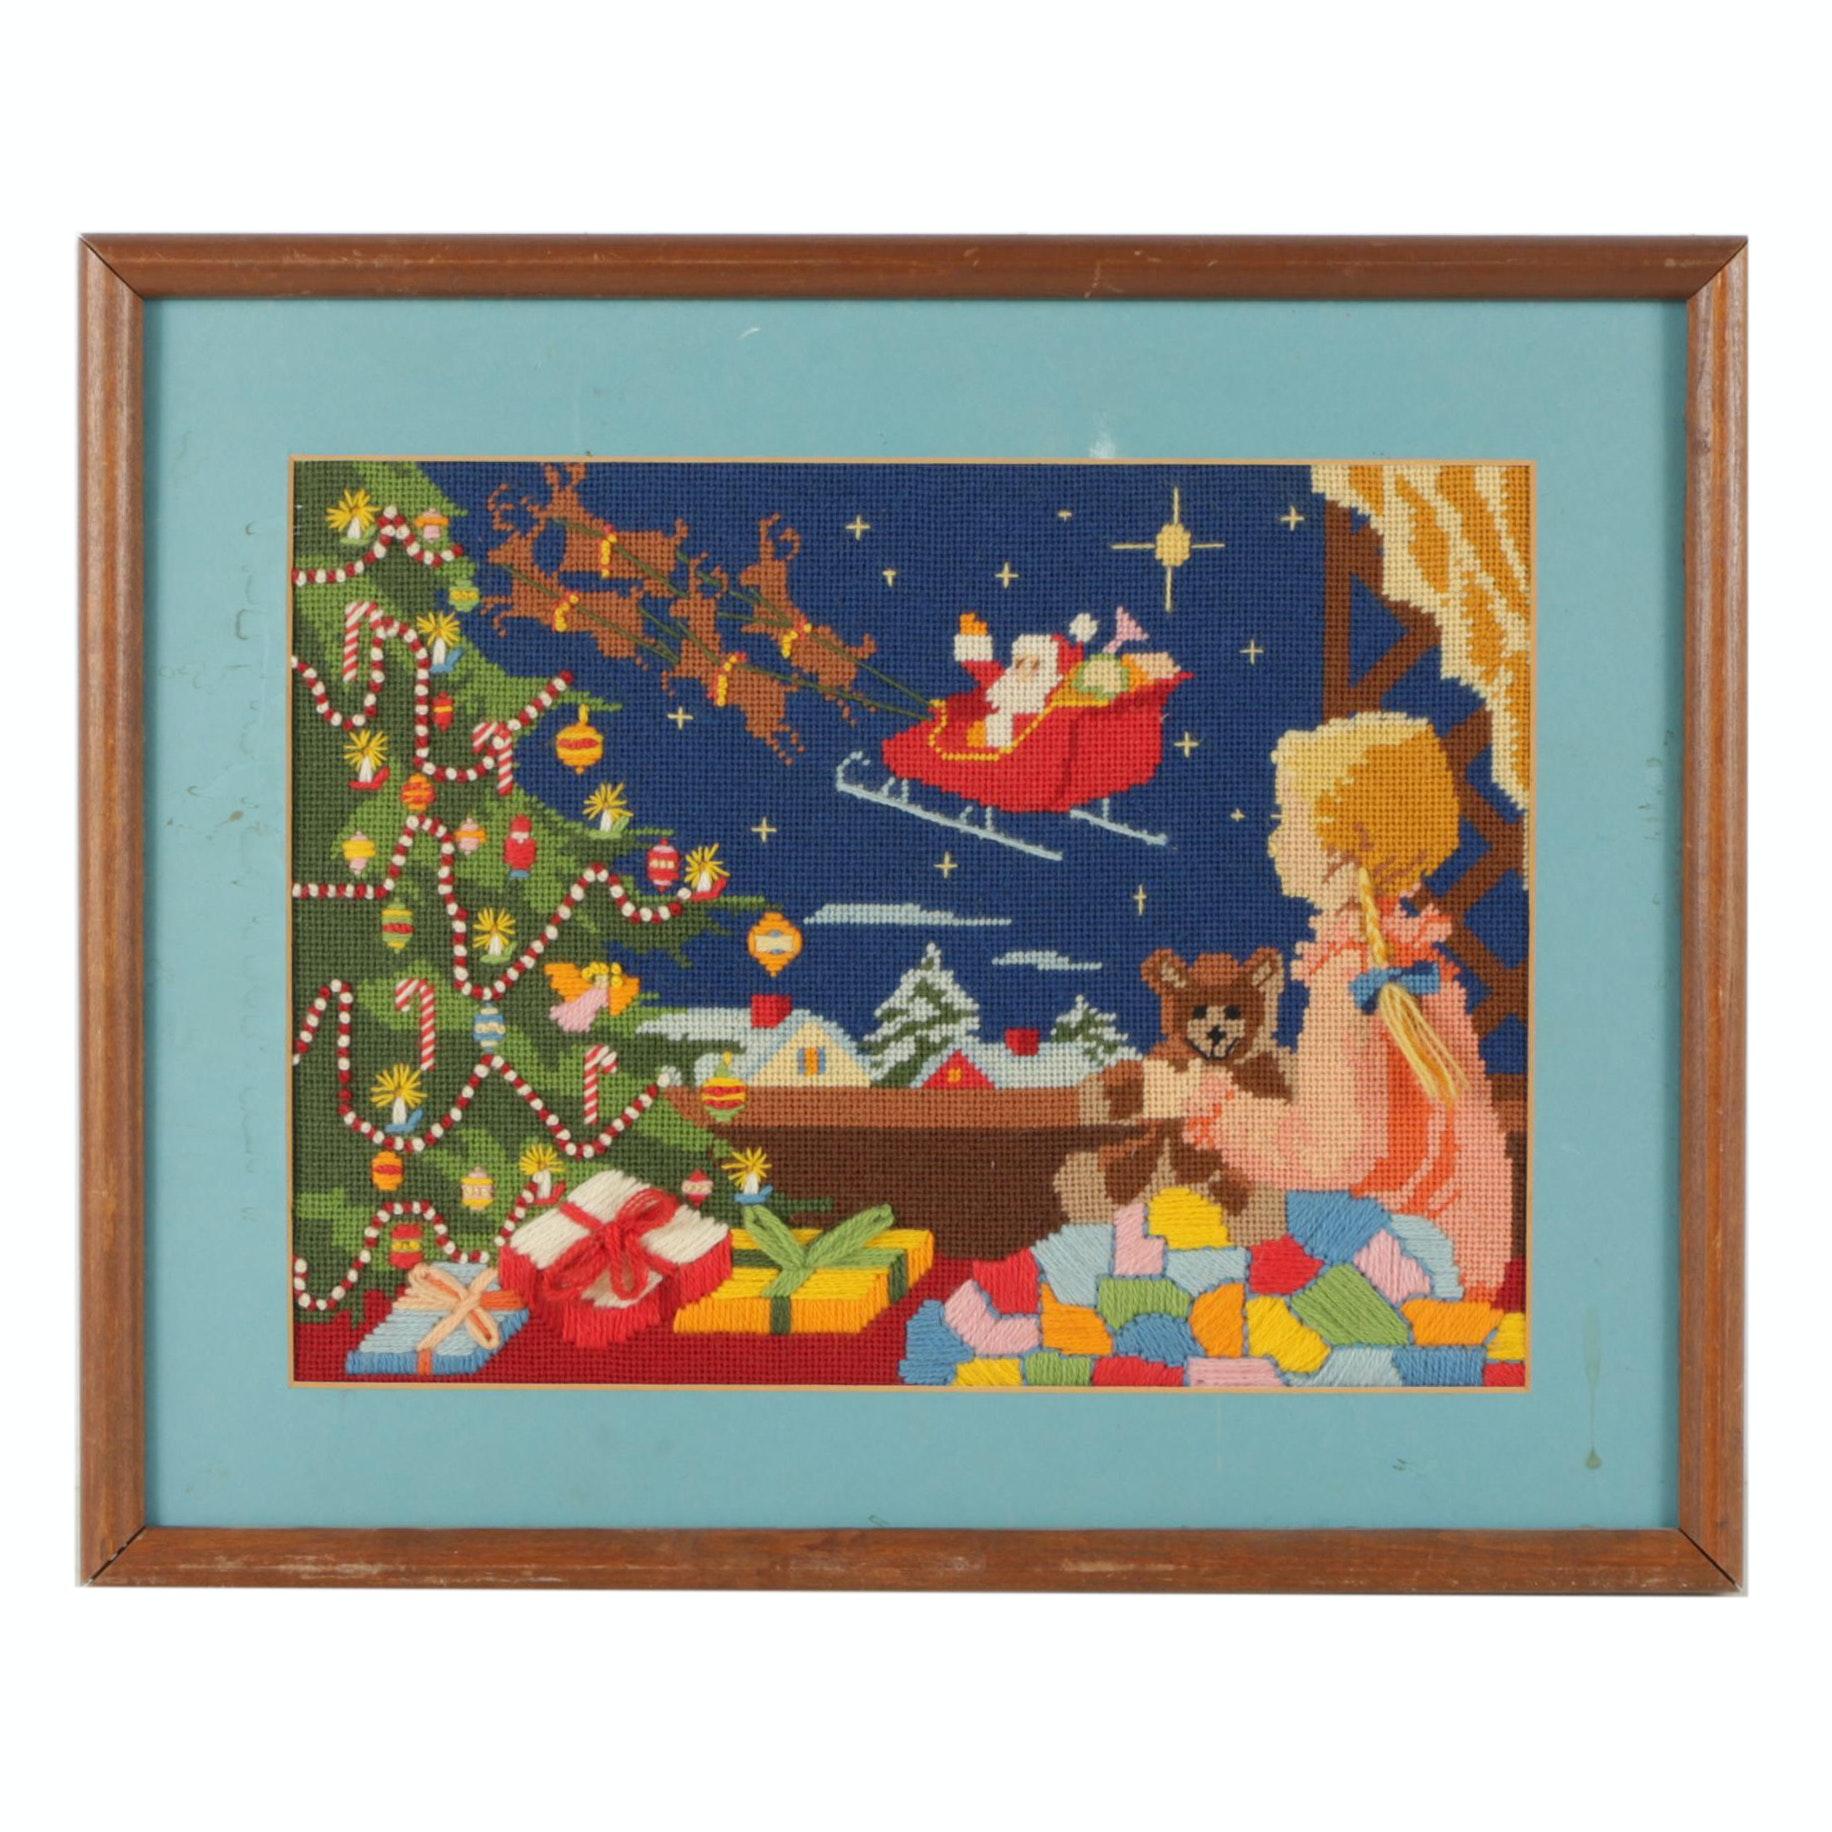 Framed Christmas Themed Pictorial Needlepoint